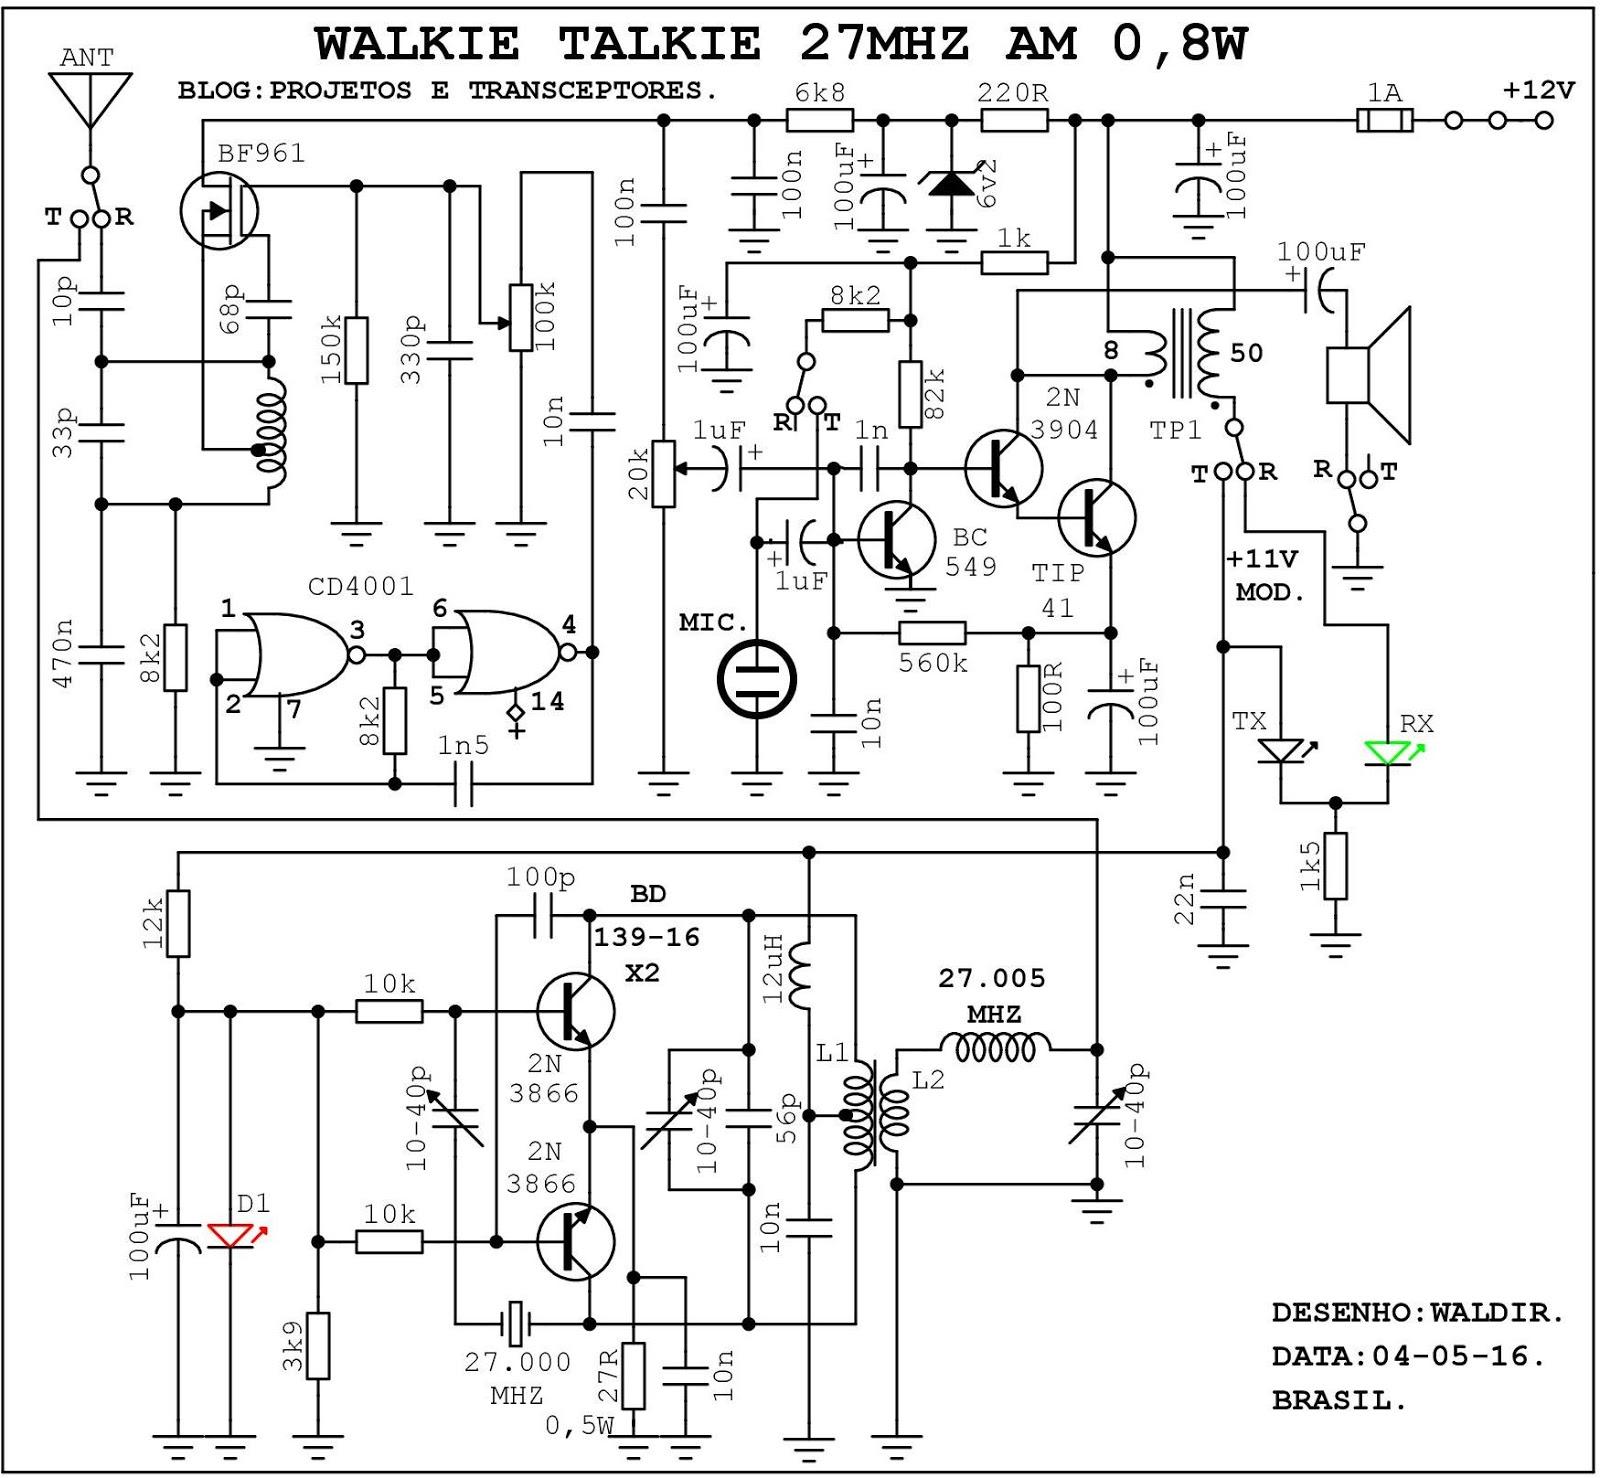 projetos e transceptores   simples walkie talkie 27mhz am